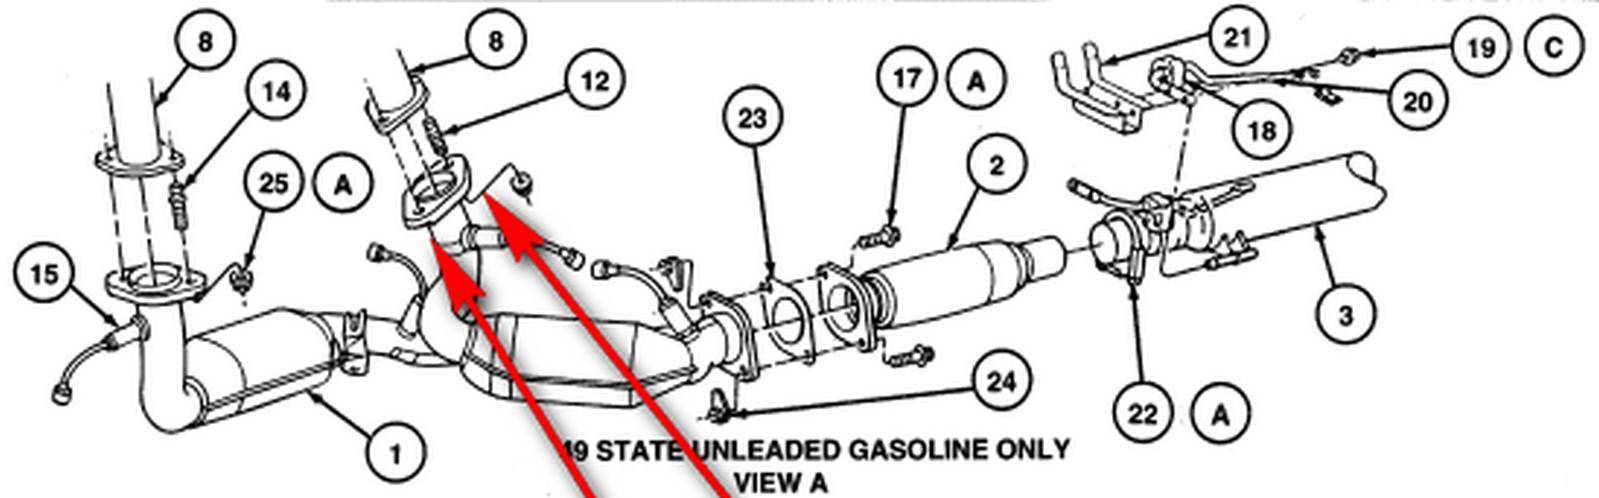 1997 Ford Taurus gl: catalytic converter..3.0L engine U..automatic